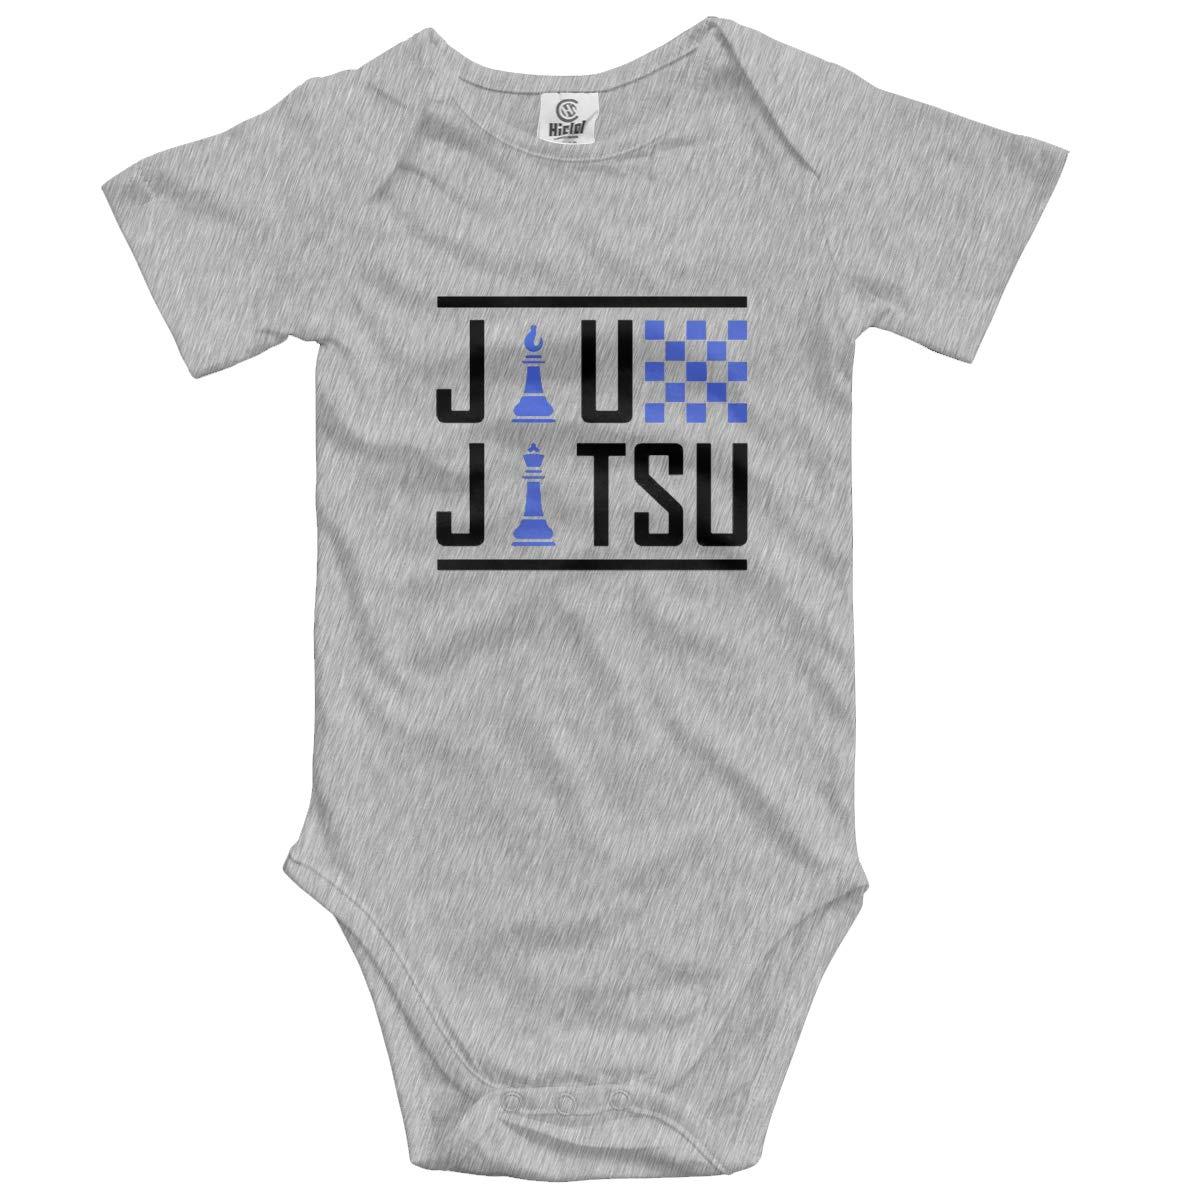 HUCON Jiu-Jitsu Chess Baby Boys Girls Jumpsuit Onesies Funny T Shirt